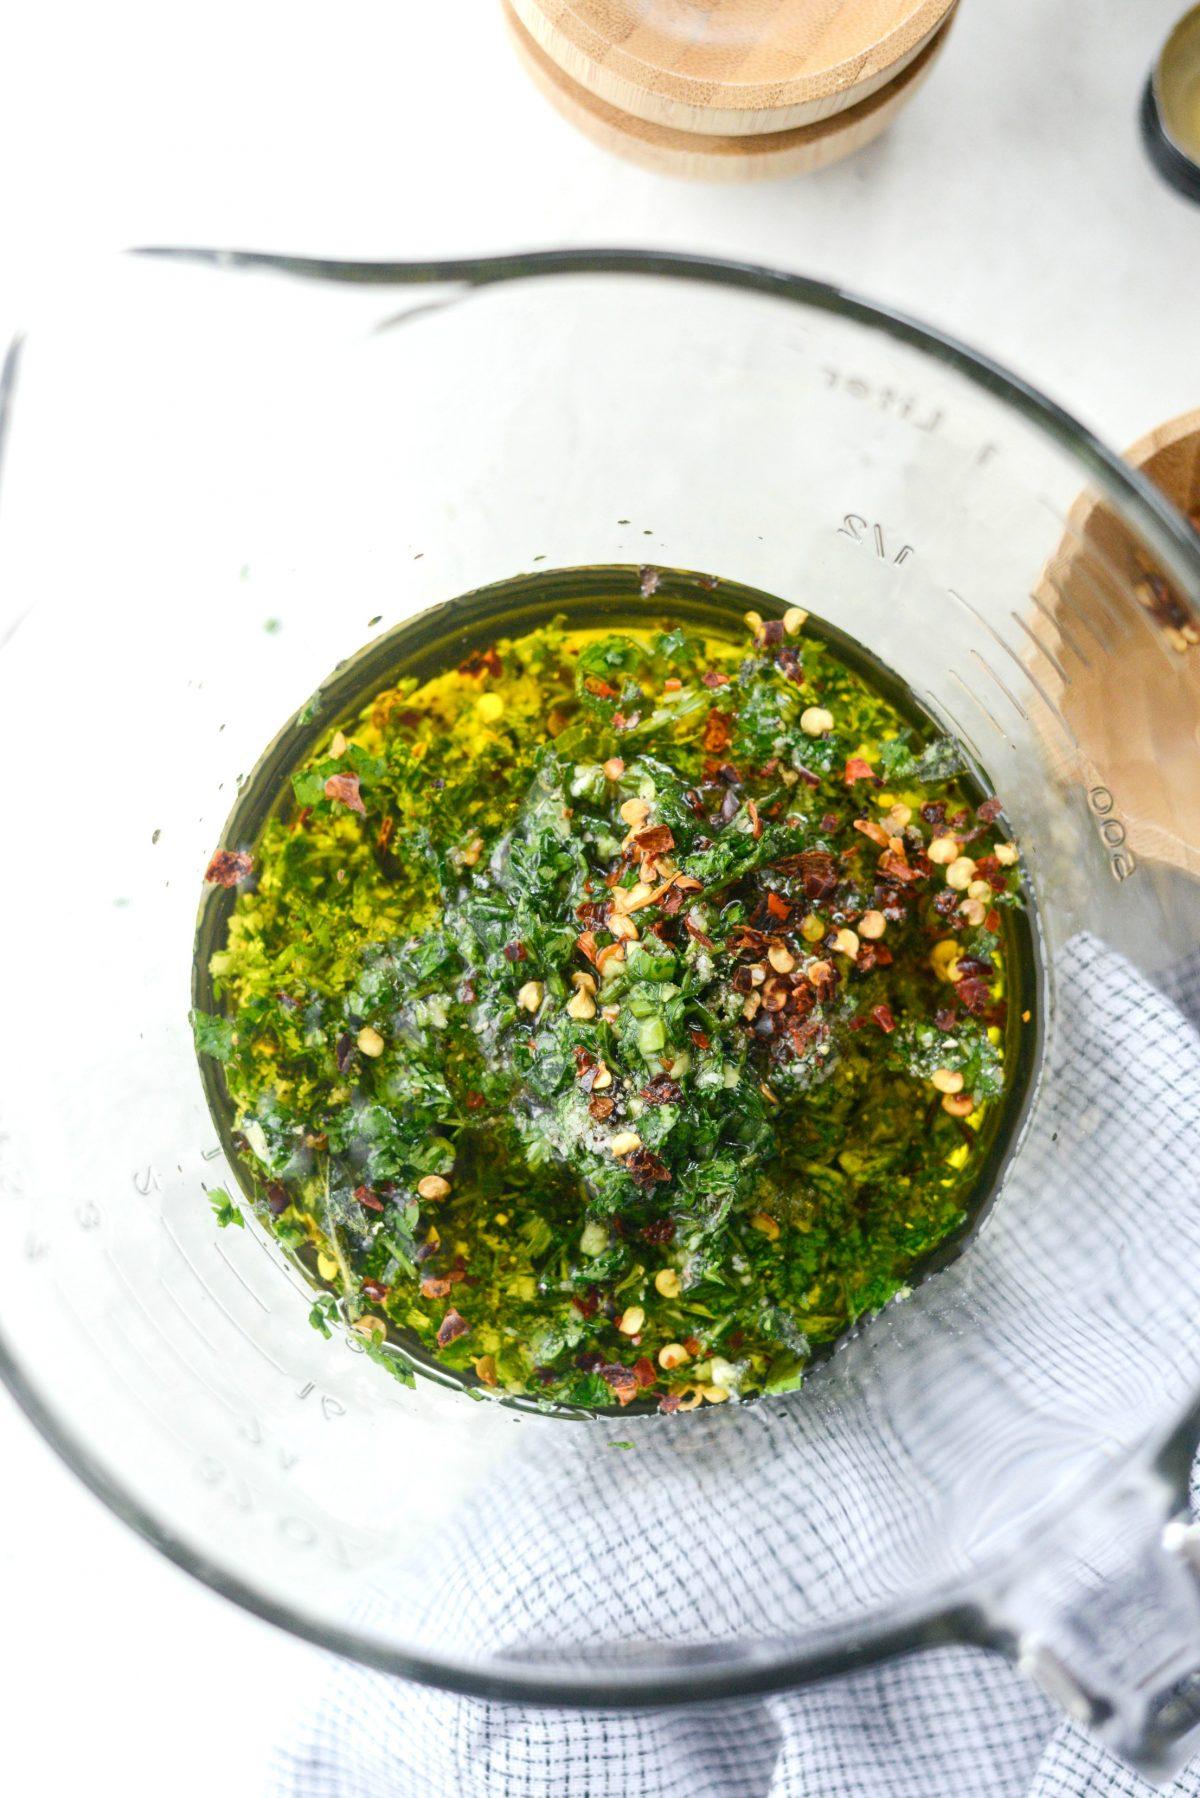 Cilantro Chimichurri Sauce l SimplyScratch.com